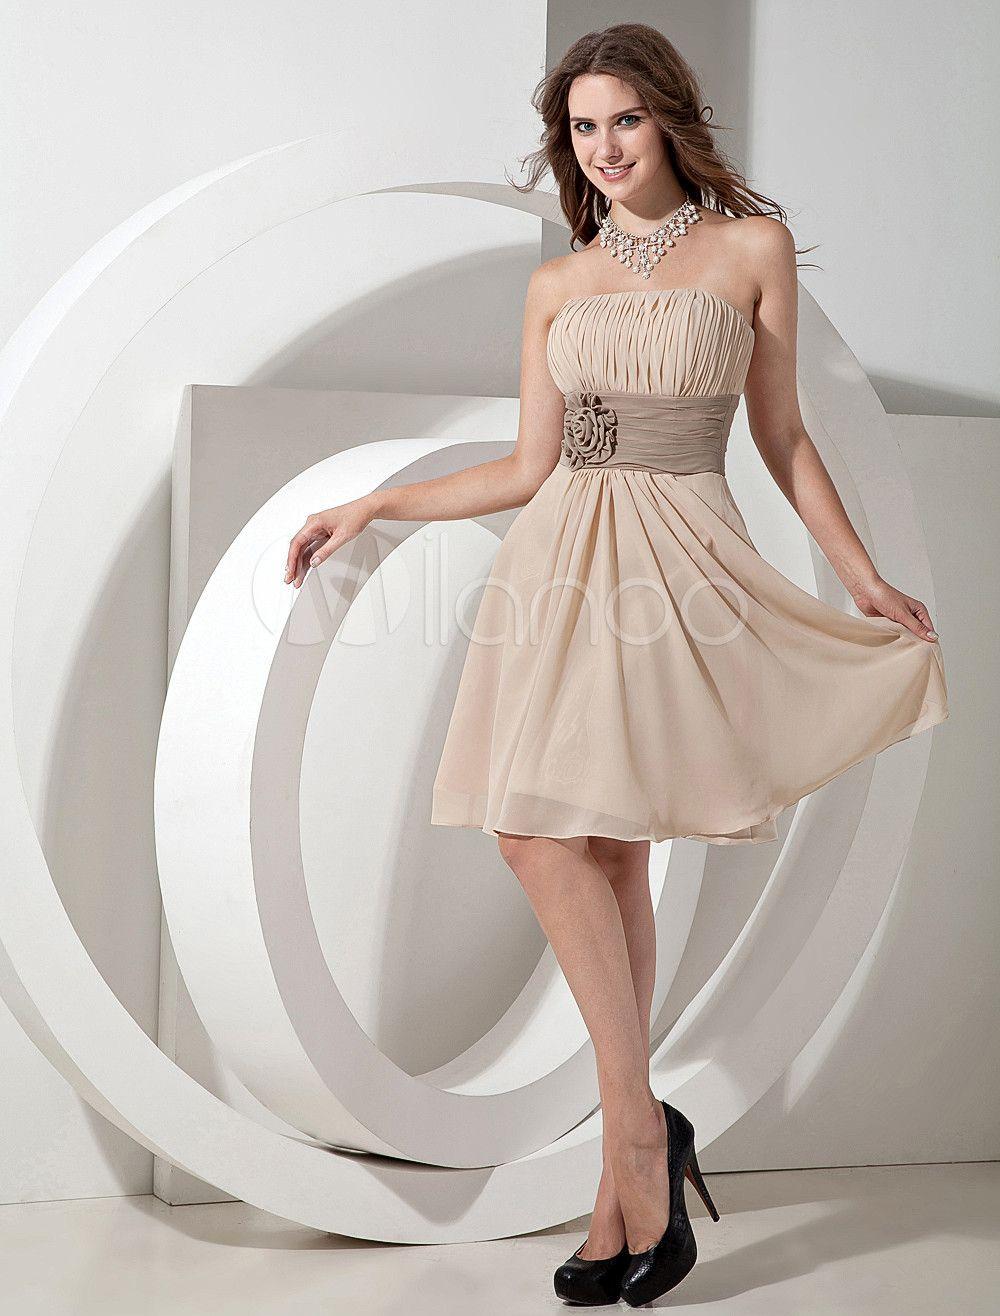 Chiffon Strapless Knee Length Bridesmaid Dress With Flowers   Women ... ab4d71e1a0